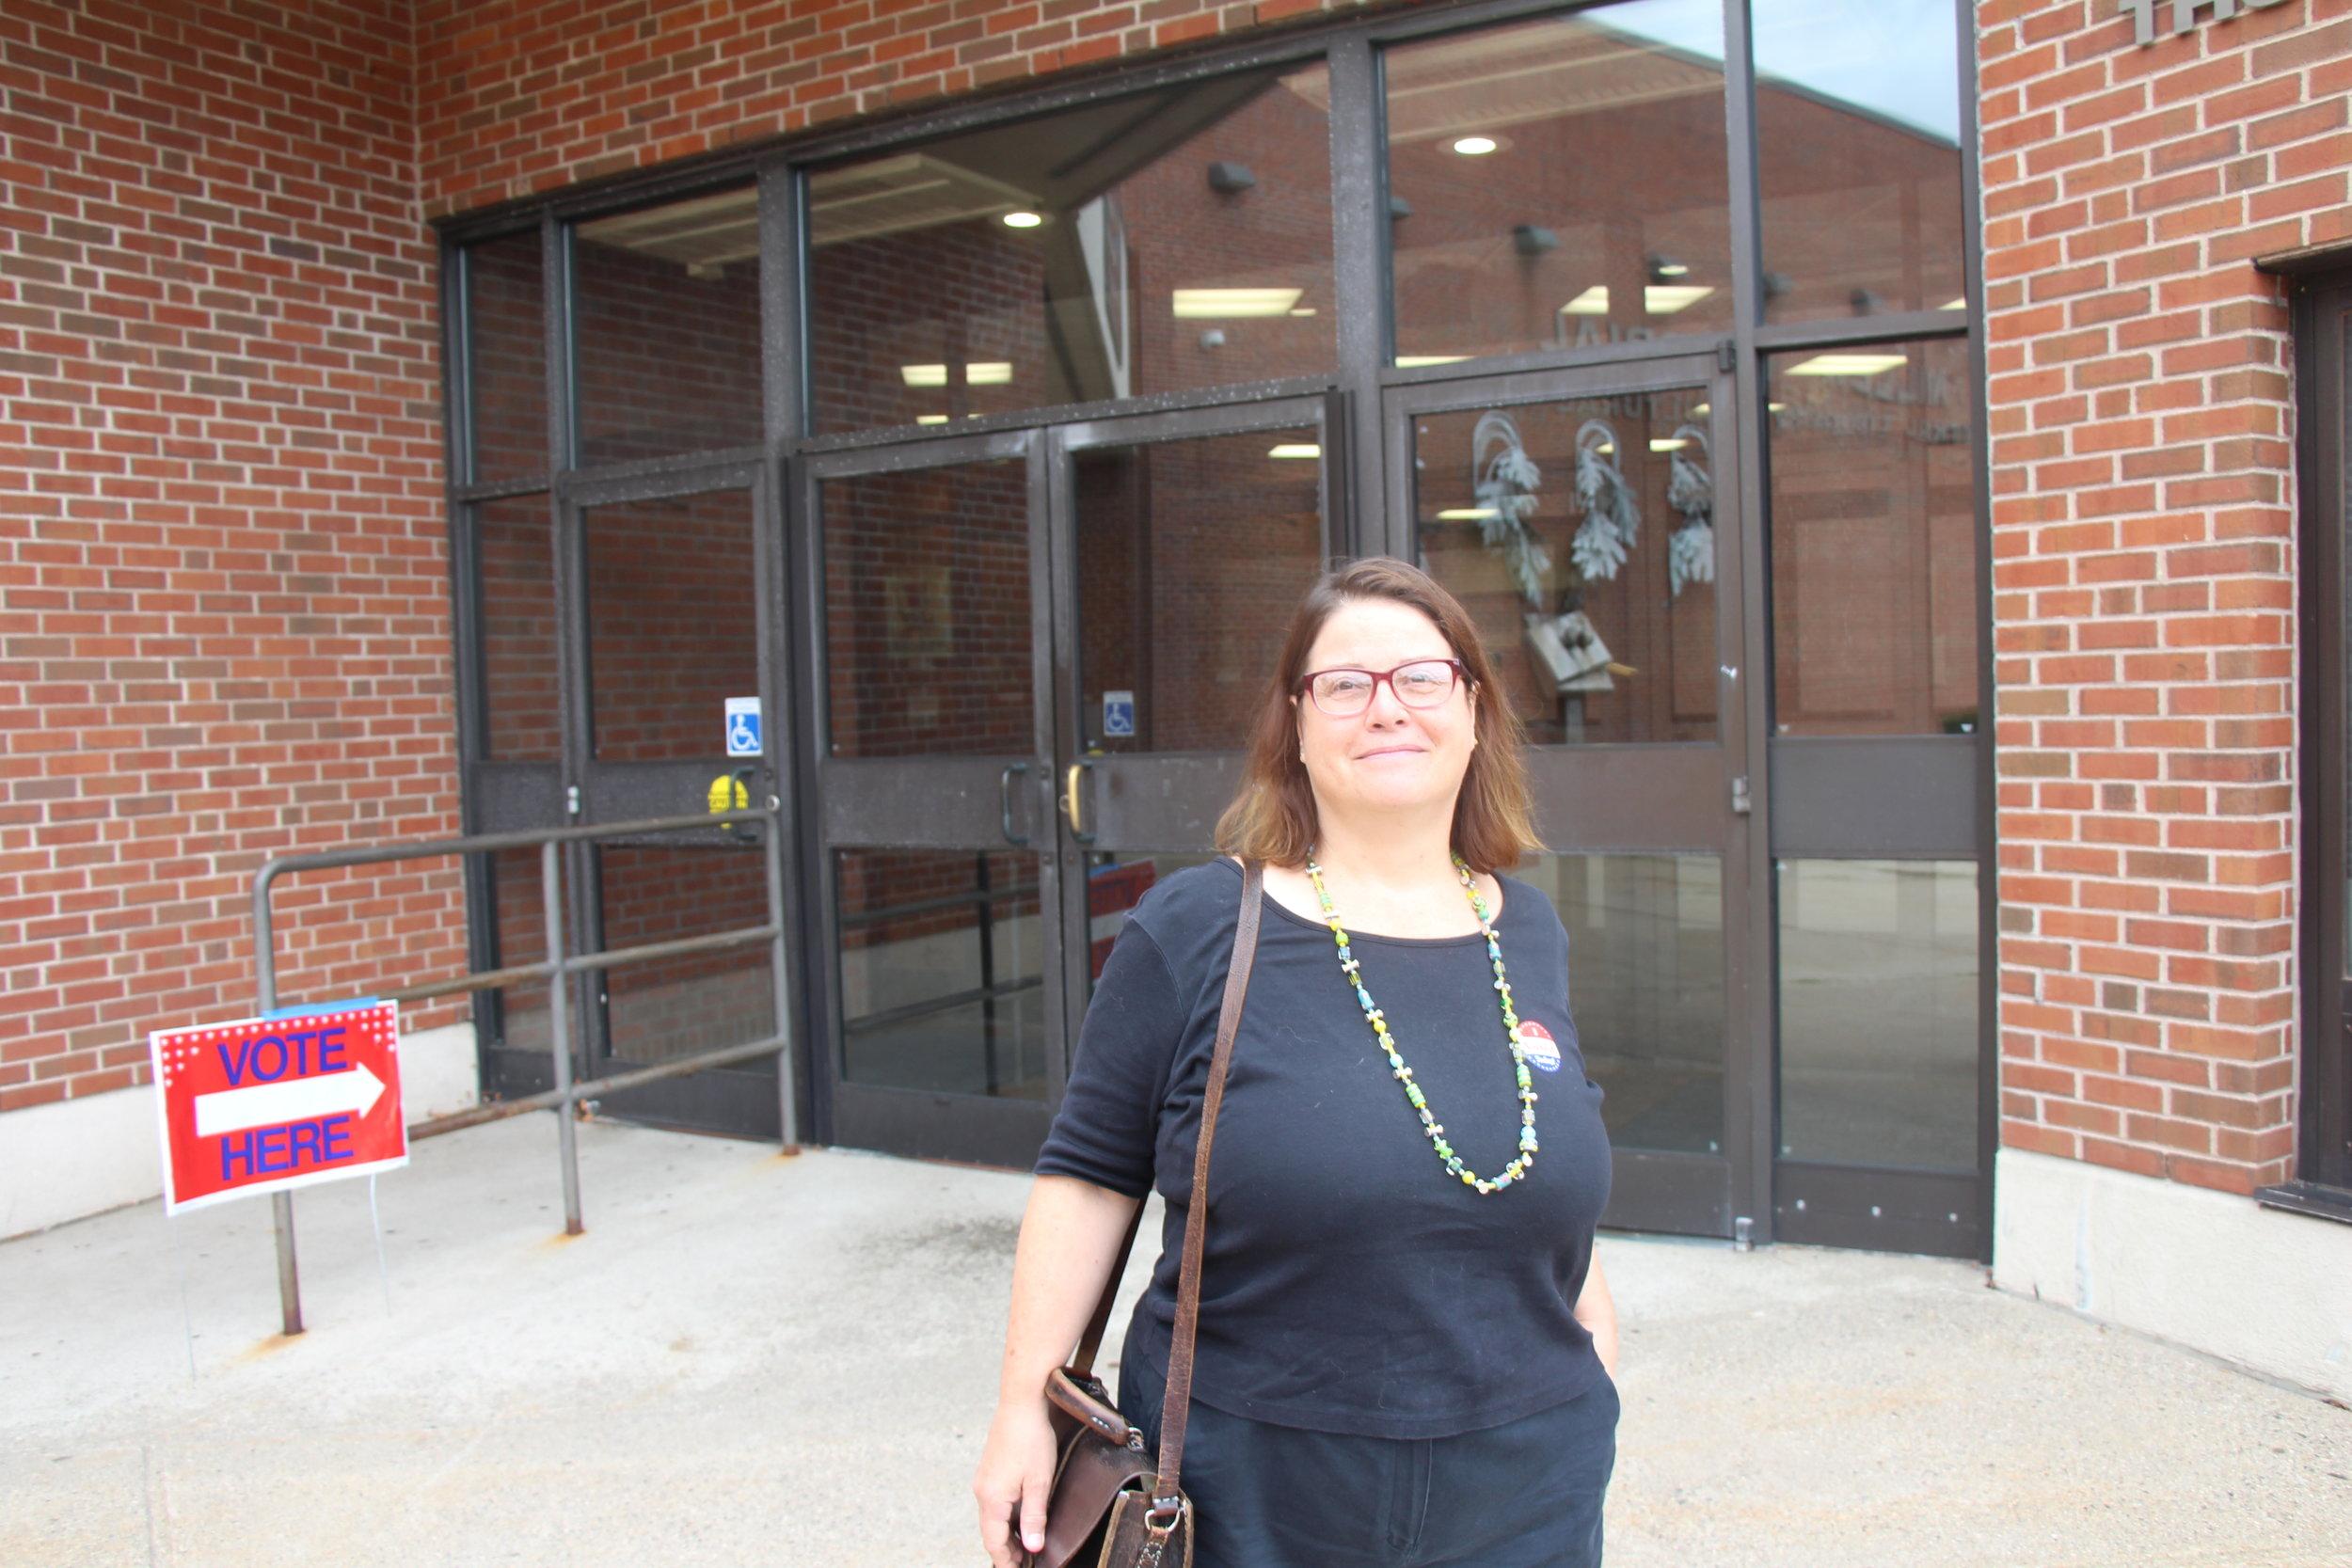 Sarah Ruden believes that a new mayor will help fix Hamden's problems with Quinnipiac University.